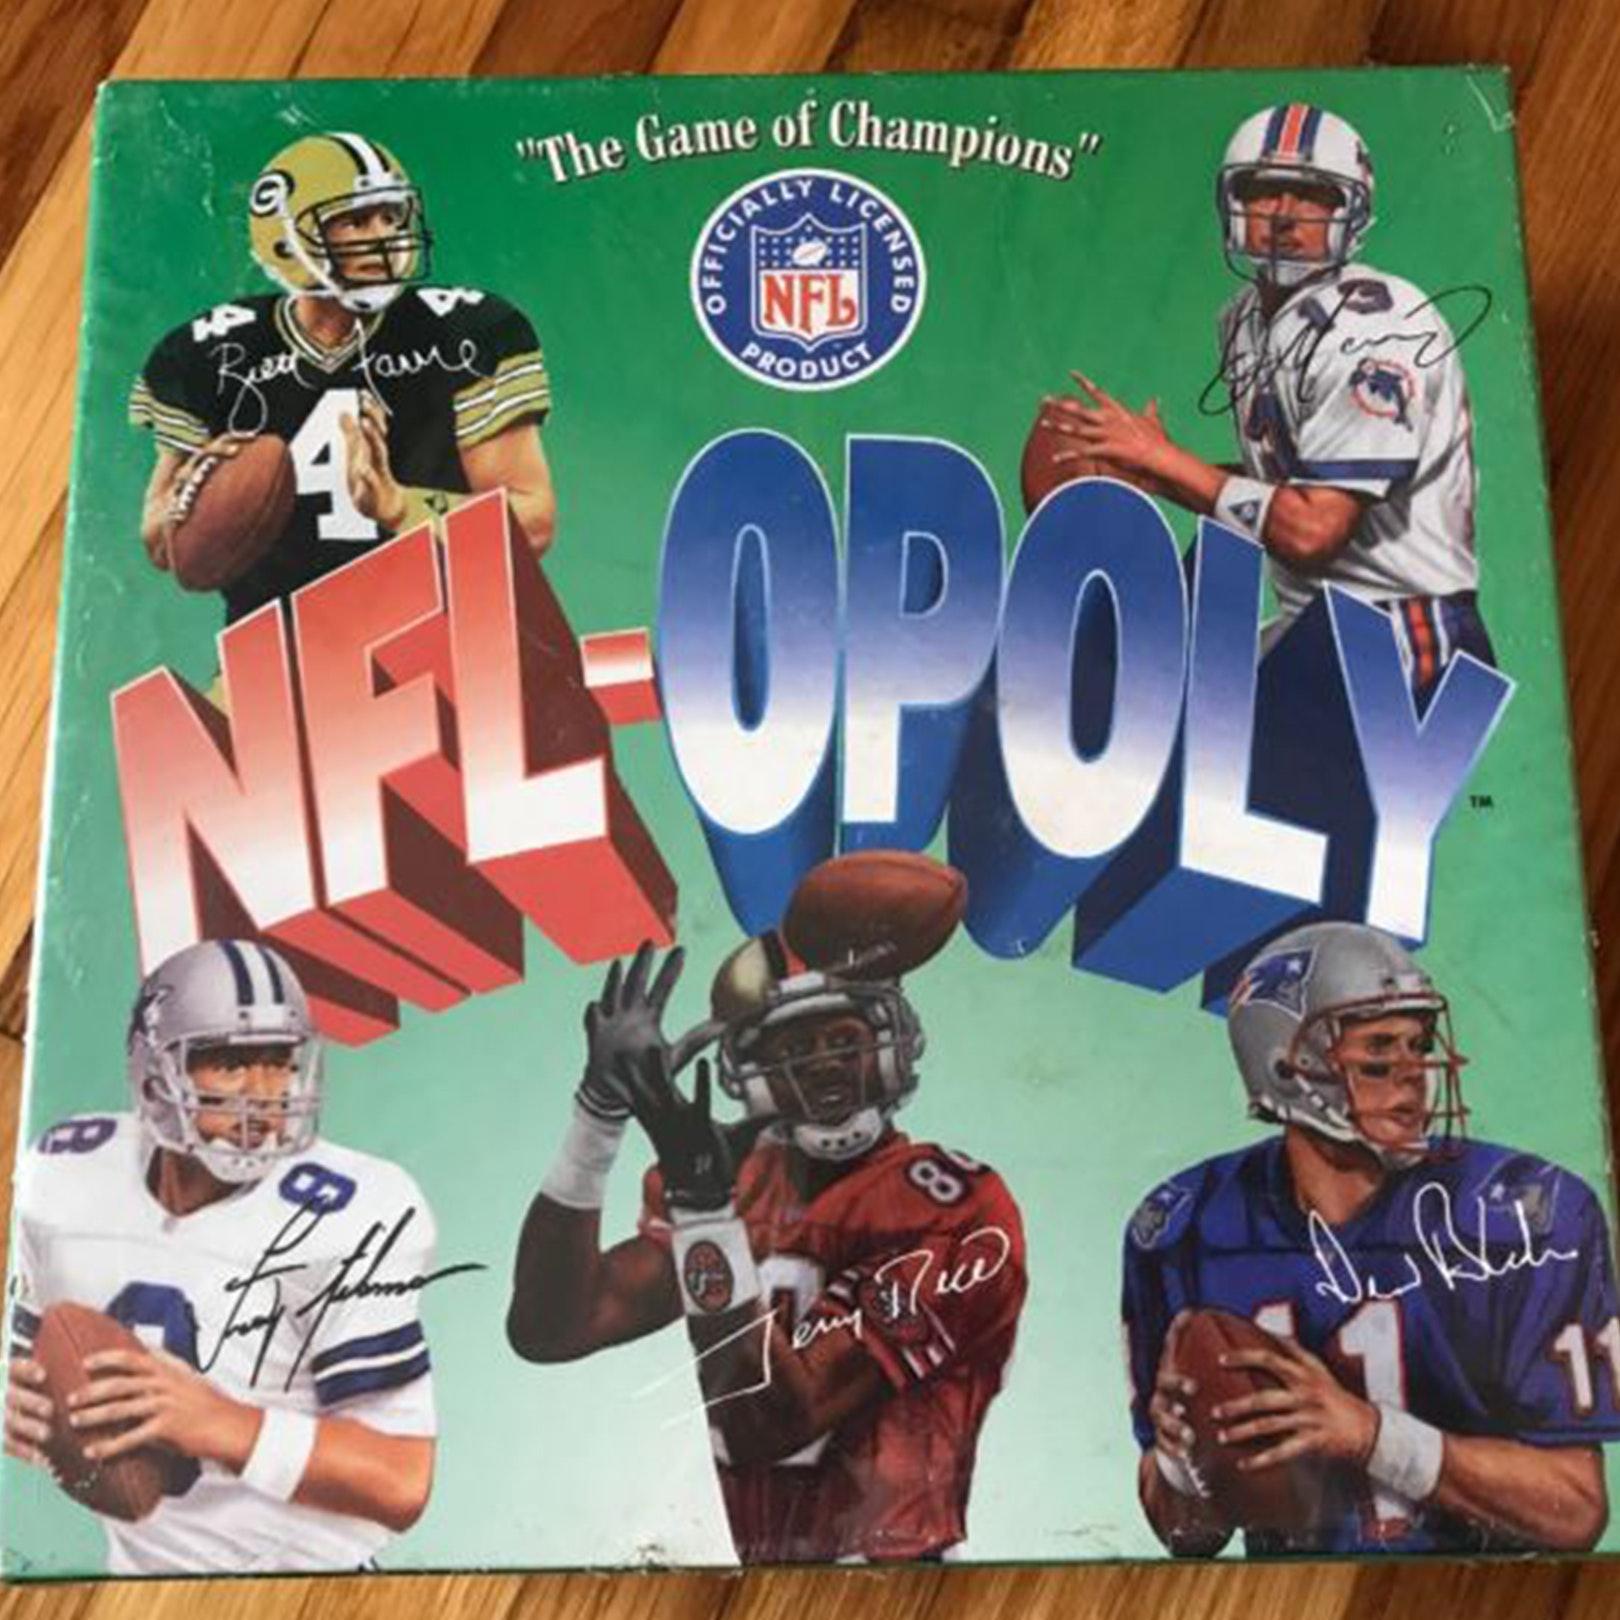 NFL opoly One37pmholidaychildhoodgift